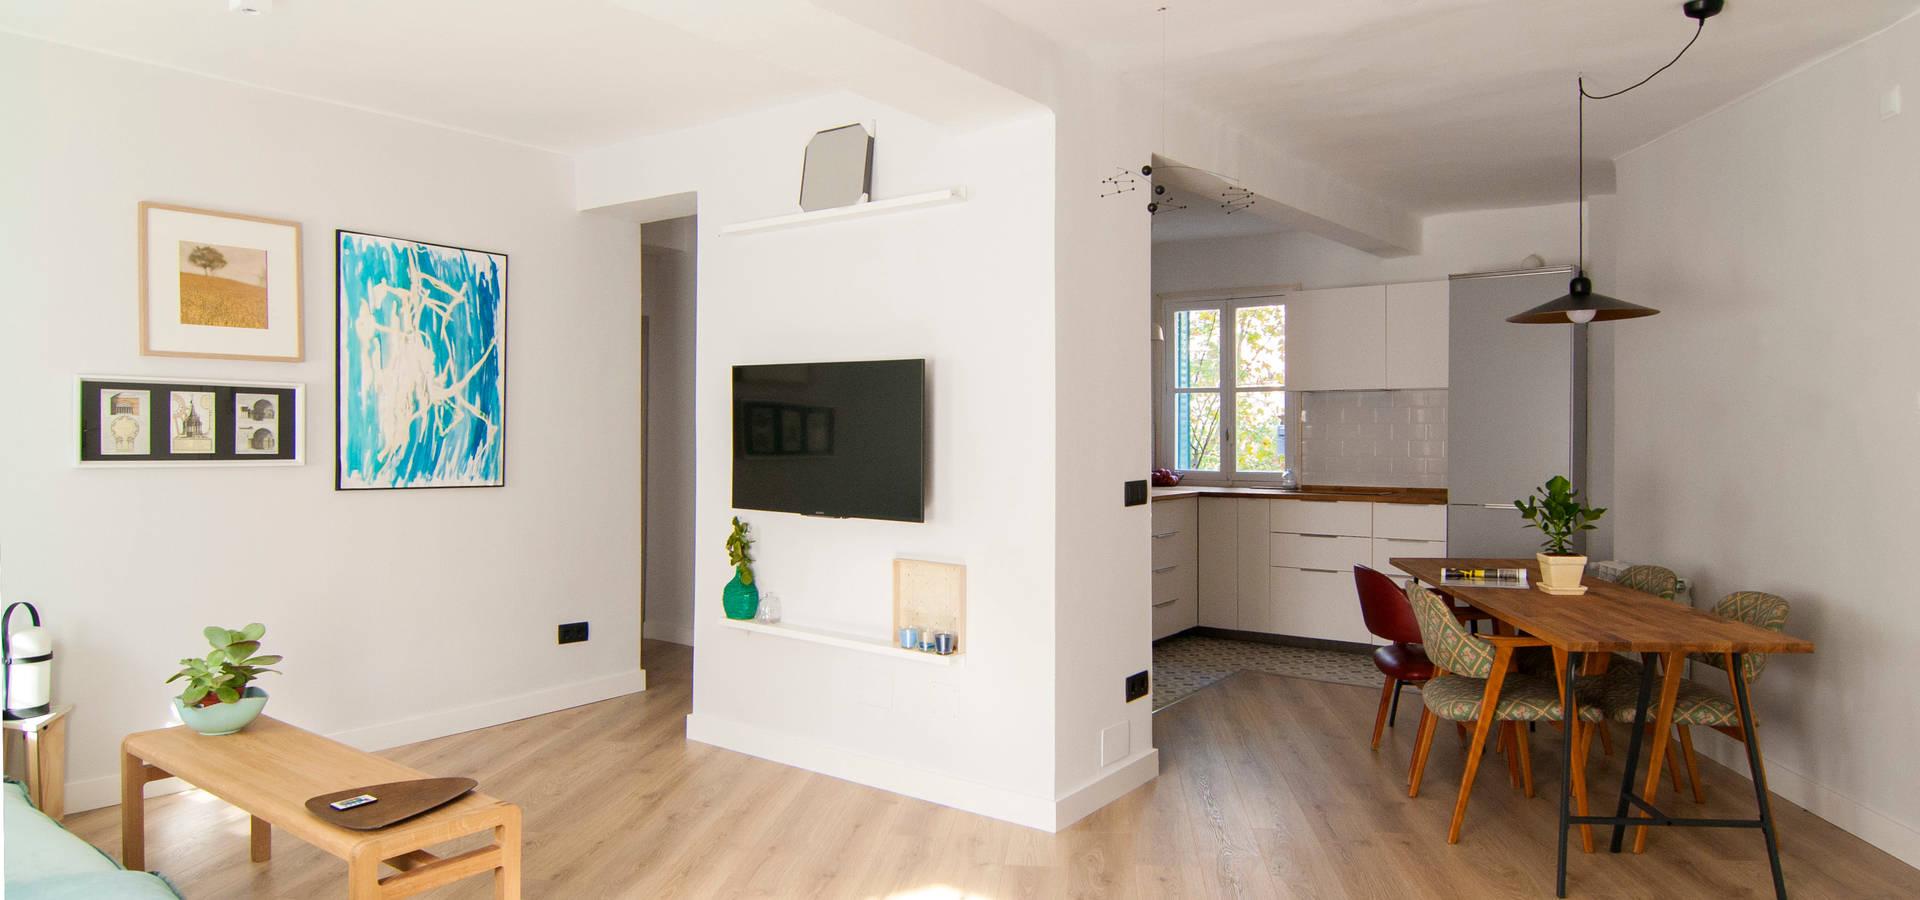 Emmme studio arquitectos de interiores en madrid homify - Arquitecto de interiores madrid ...